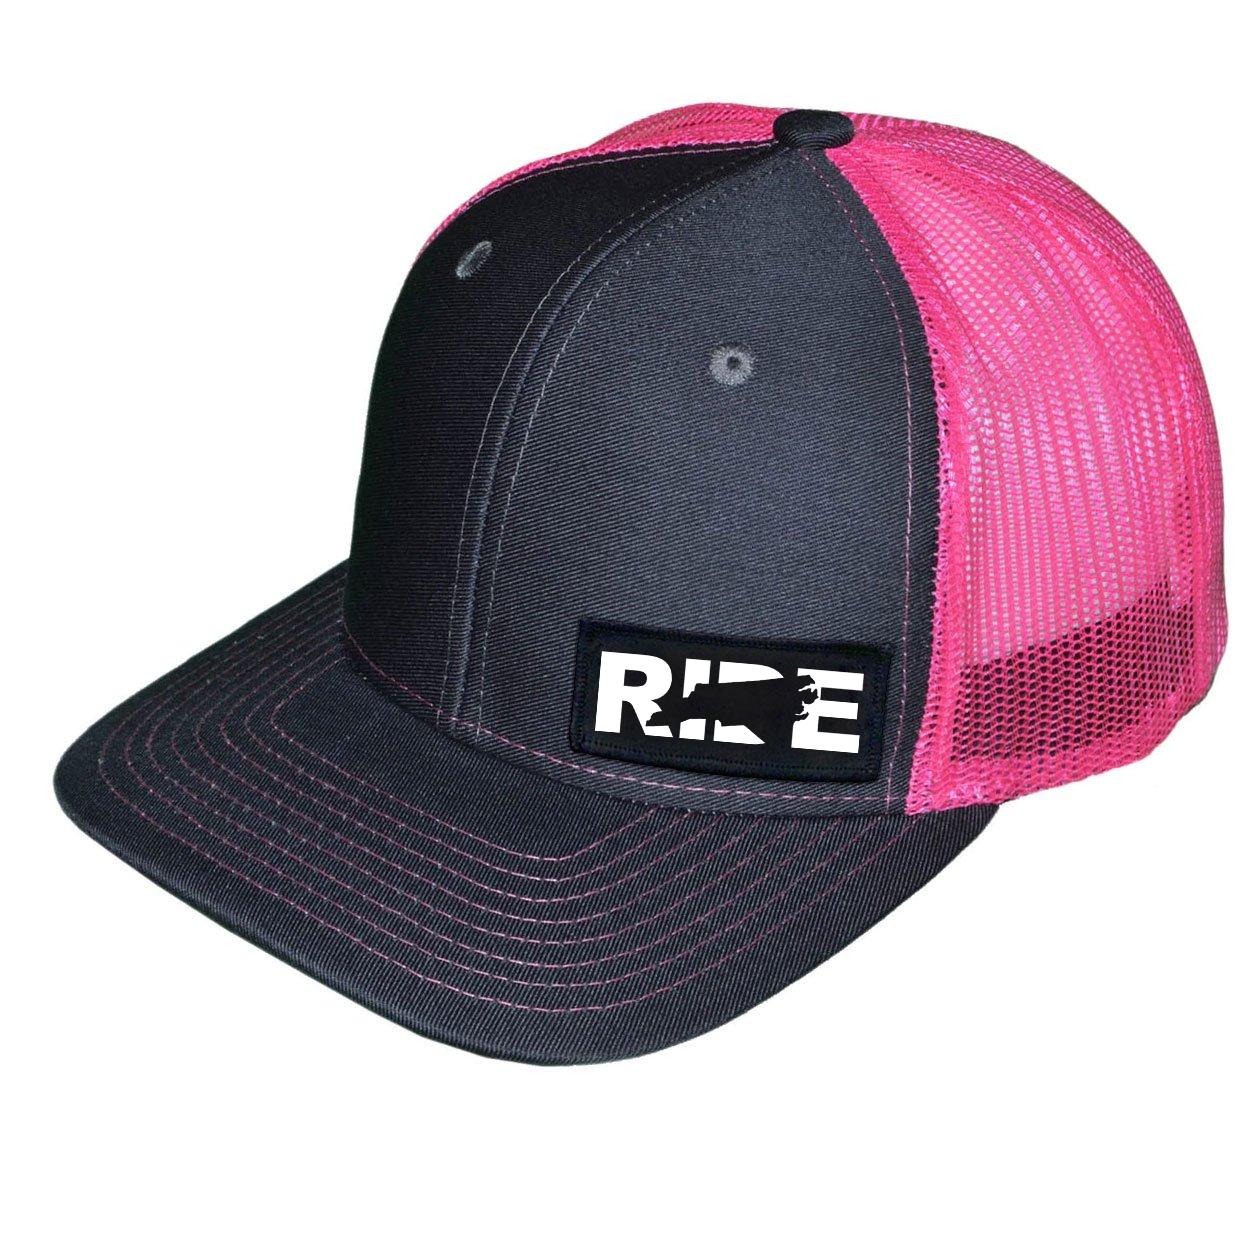 Ride North Carolina Night Out Woven Patch Snapback Trucker Hat Dark Gray/Neon Pink (White Logo)